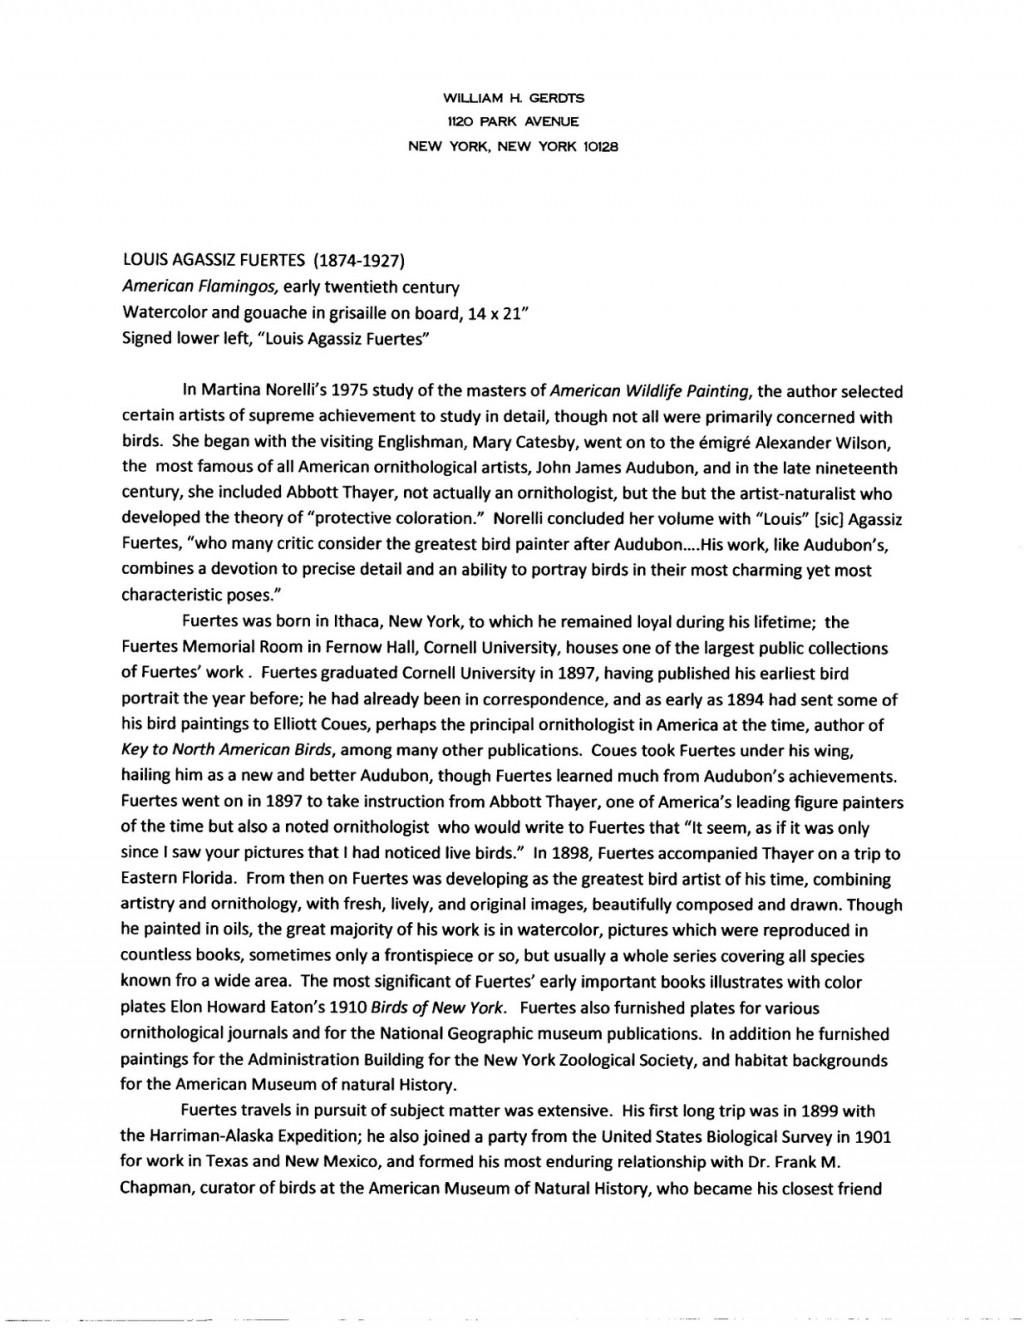 001 Essay Example Fuertes20american20flamingos20001 Graduate Fantastic School Examples Education Header Grad Sample Psychology Large